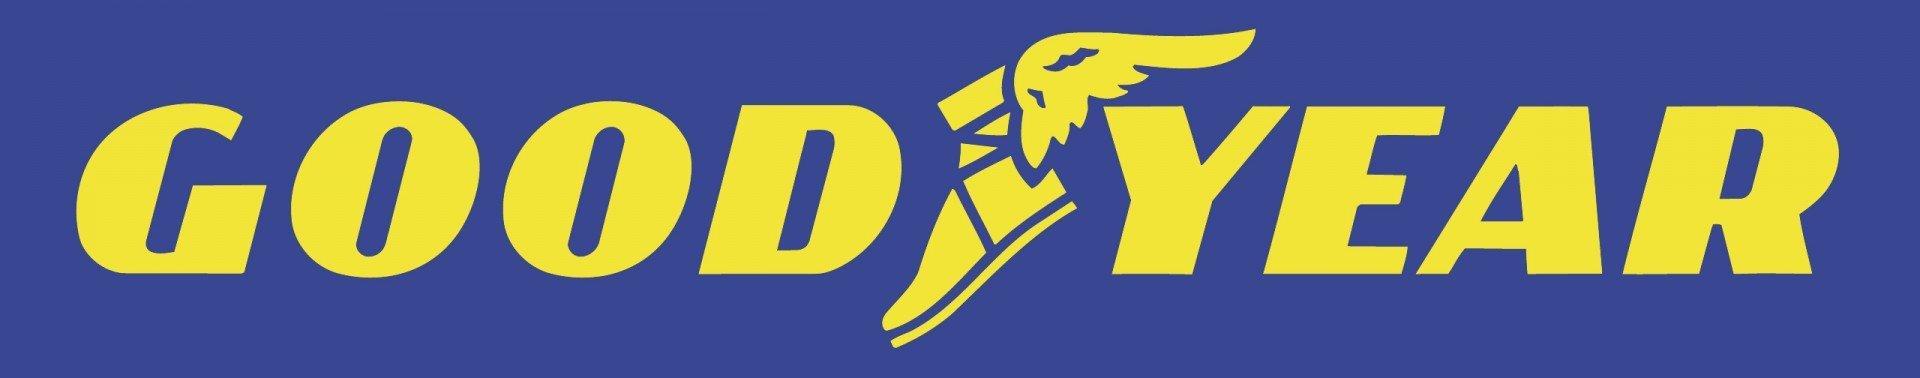 1920_goodyear-logo